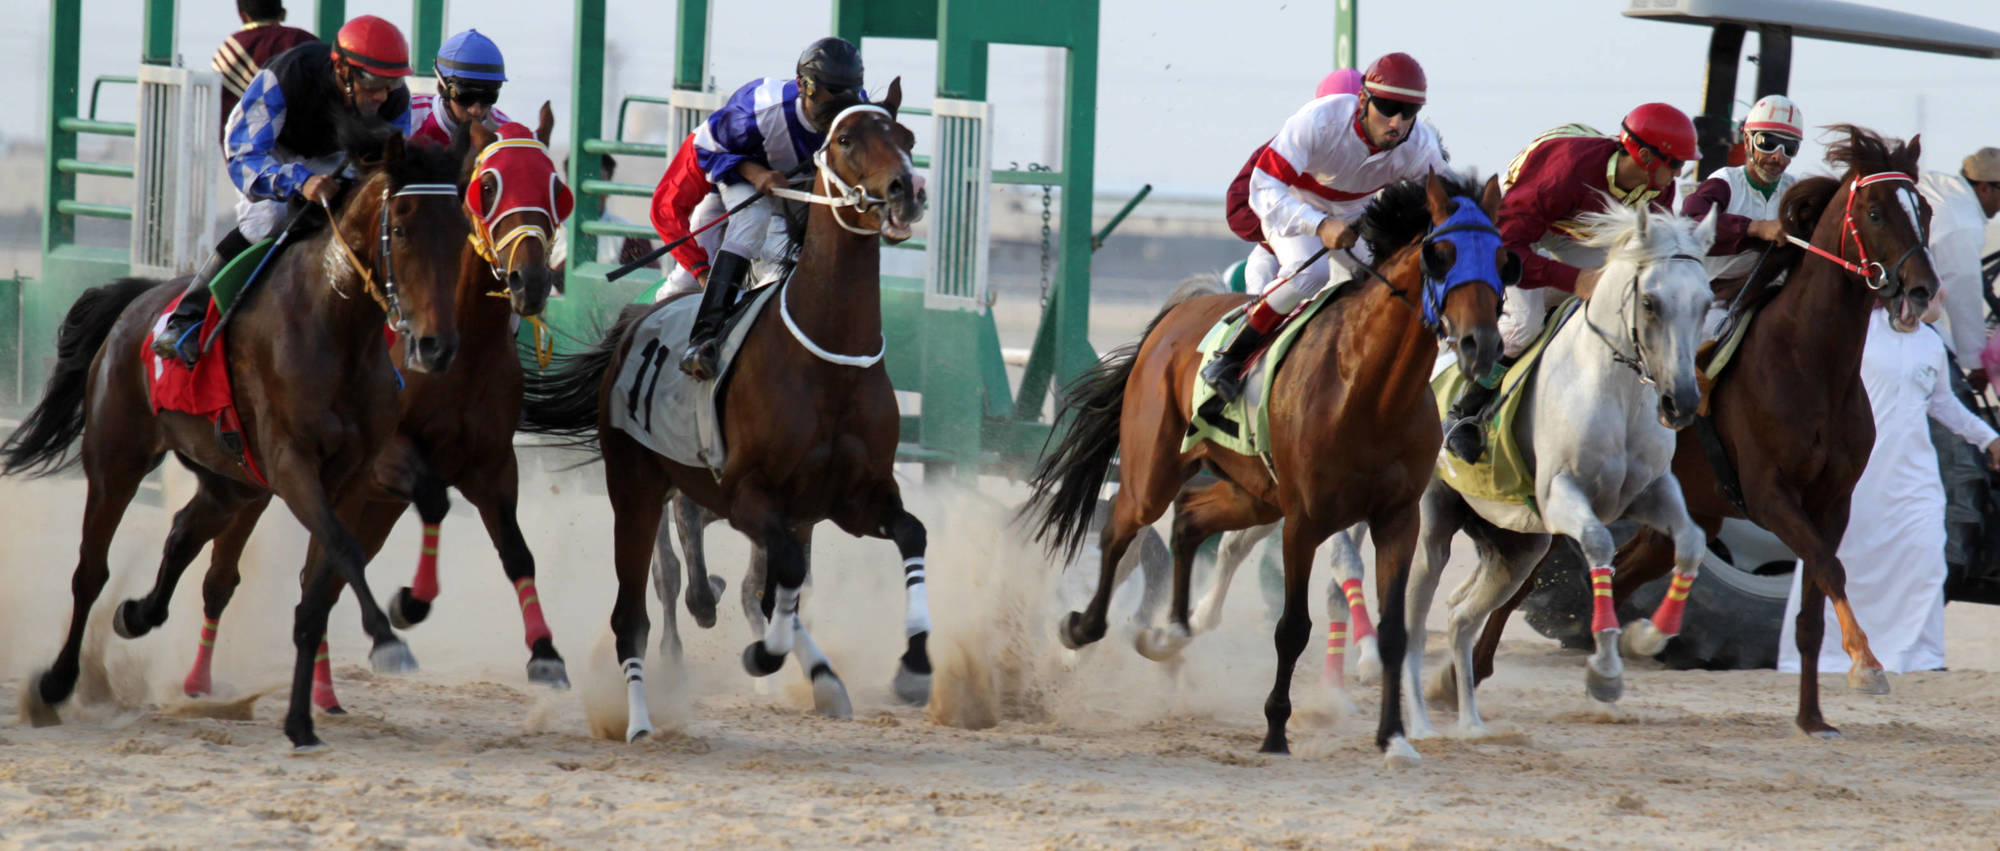 AHO Flat Race, Al Ahsaa, KSA, 2014